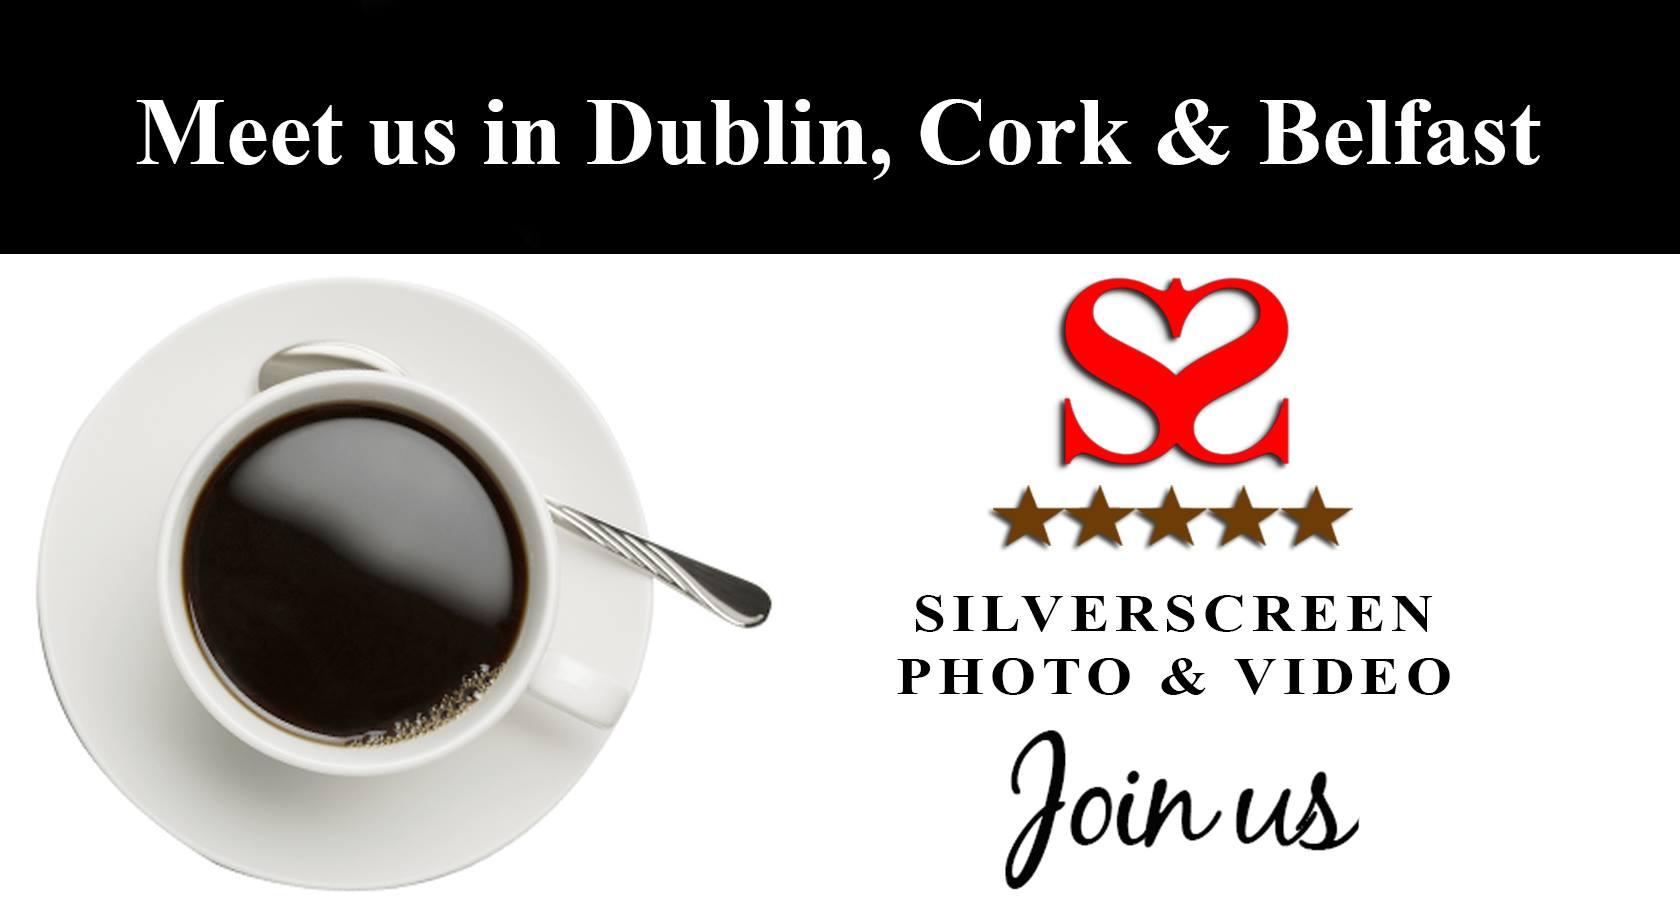 Getting married in Spain - Meet Silverscreen Photography & Video Dublin, Cork, Belfast